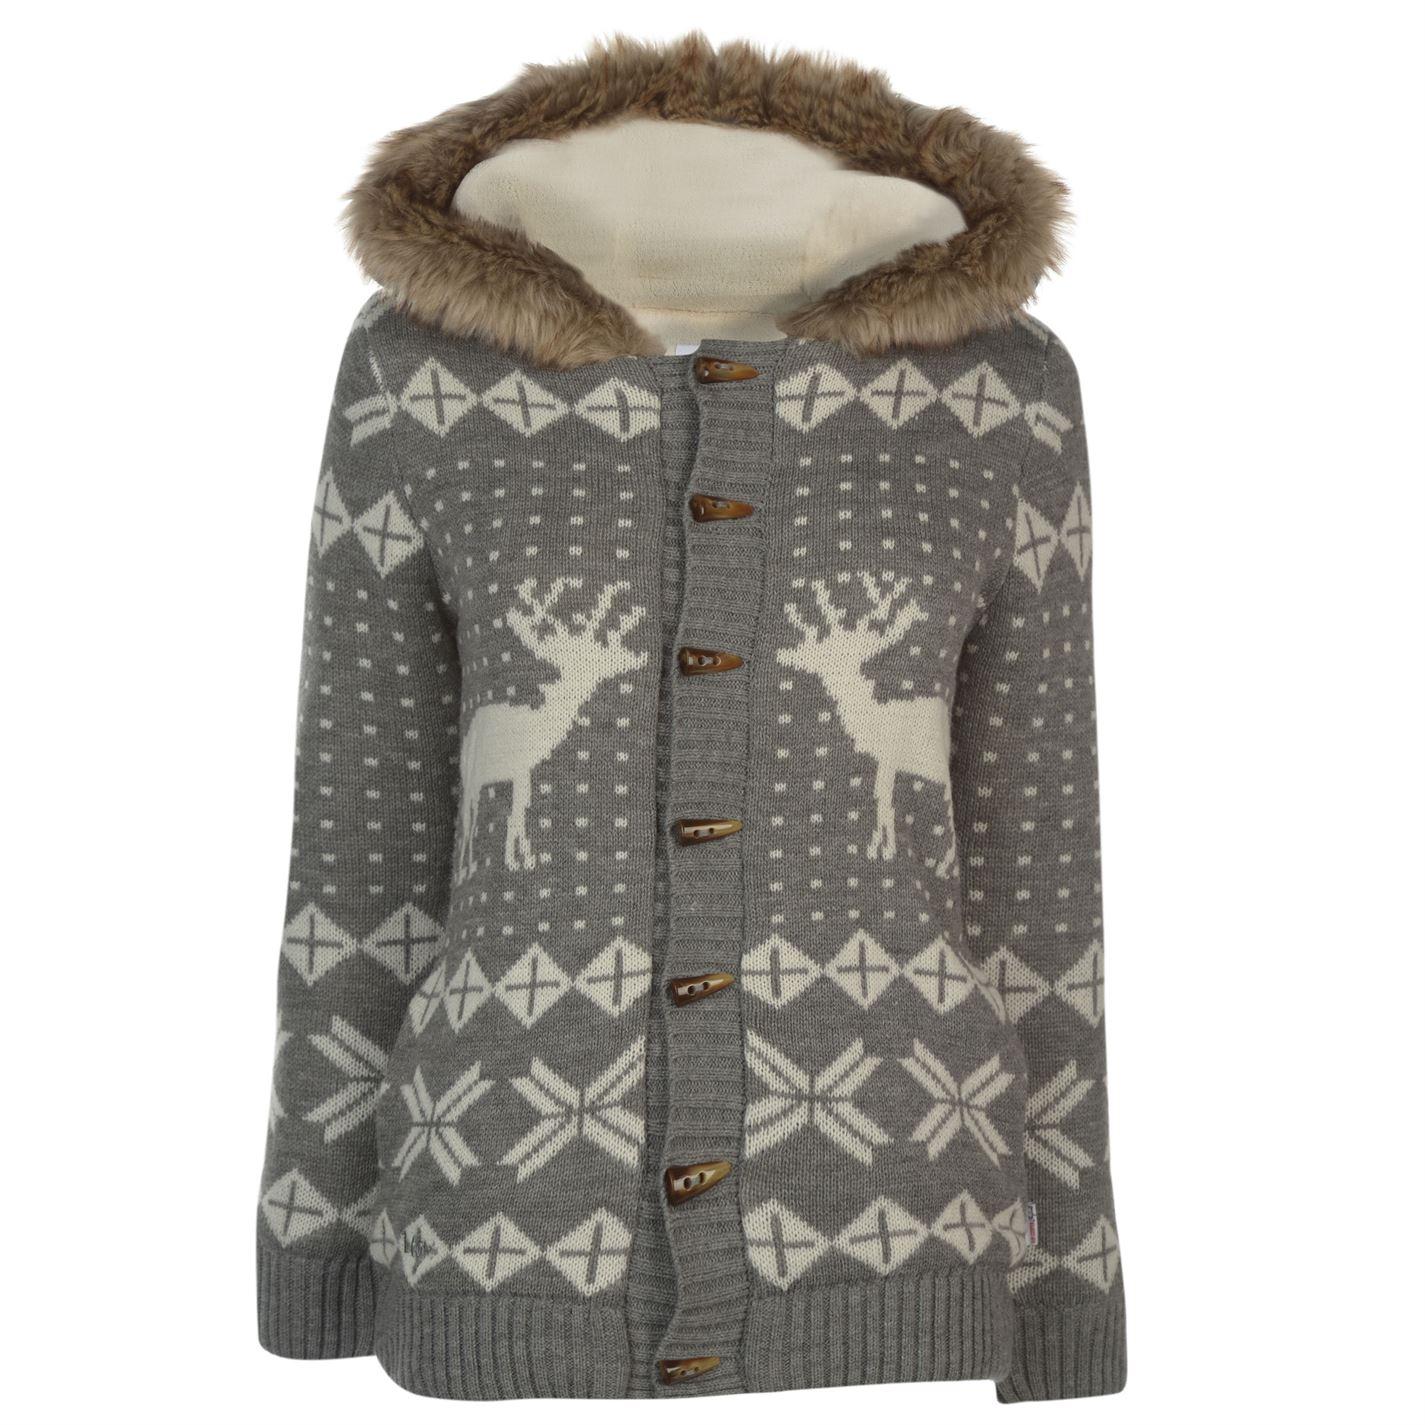 Lee Cooper Hooded Christmas Knitted Jacket dámské